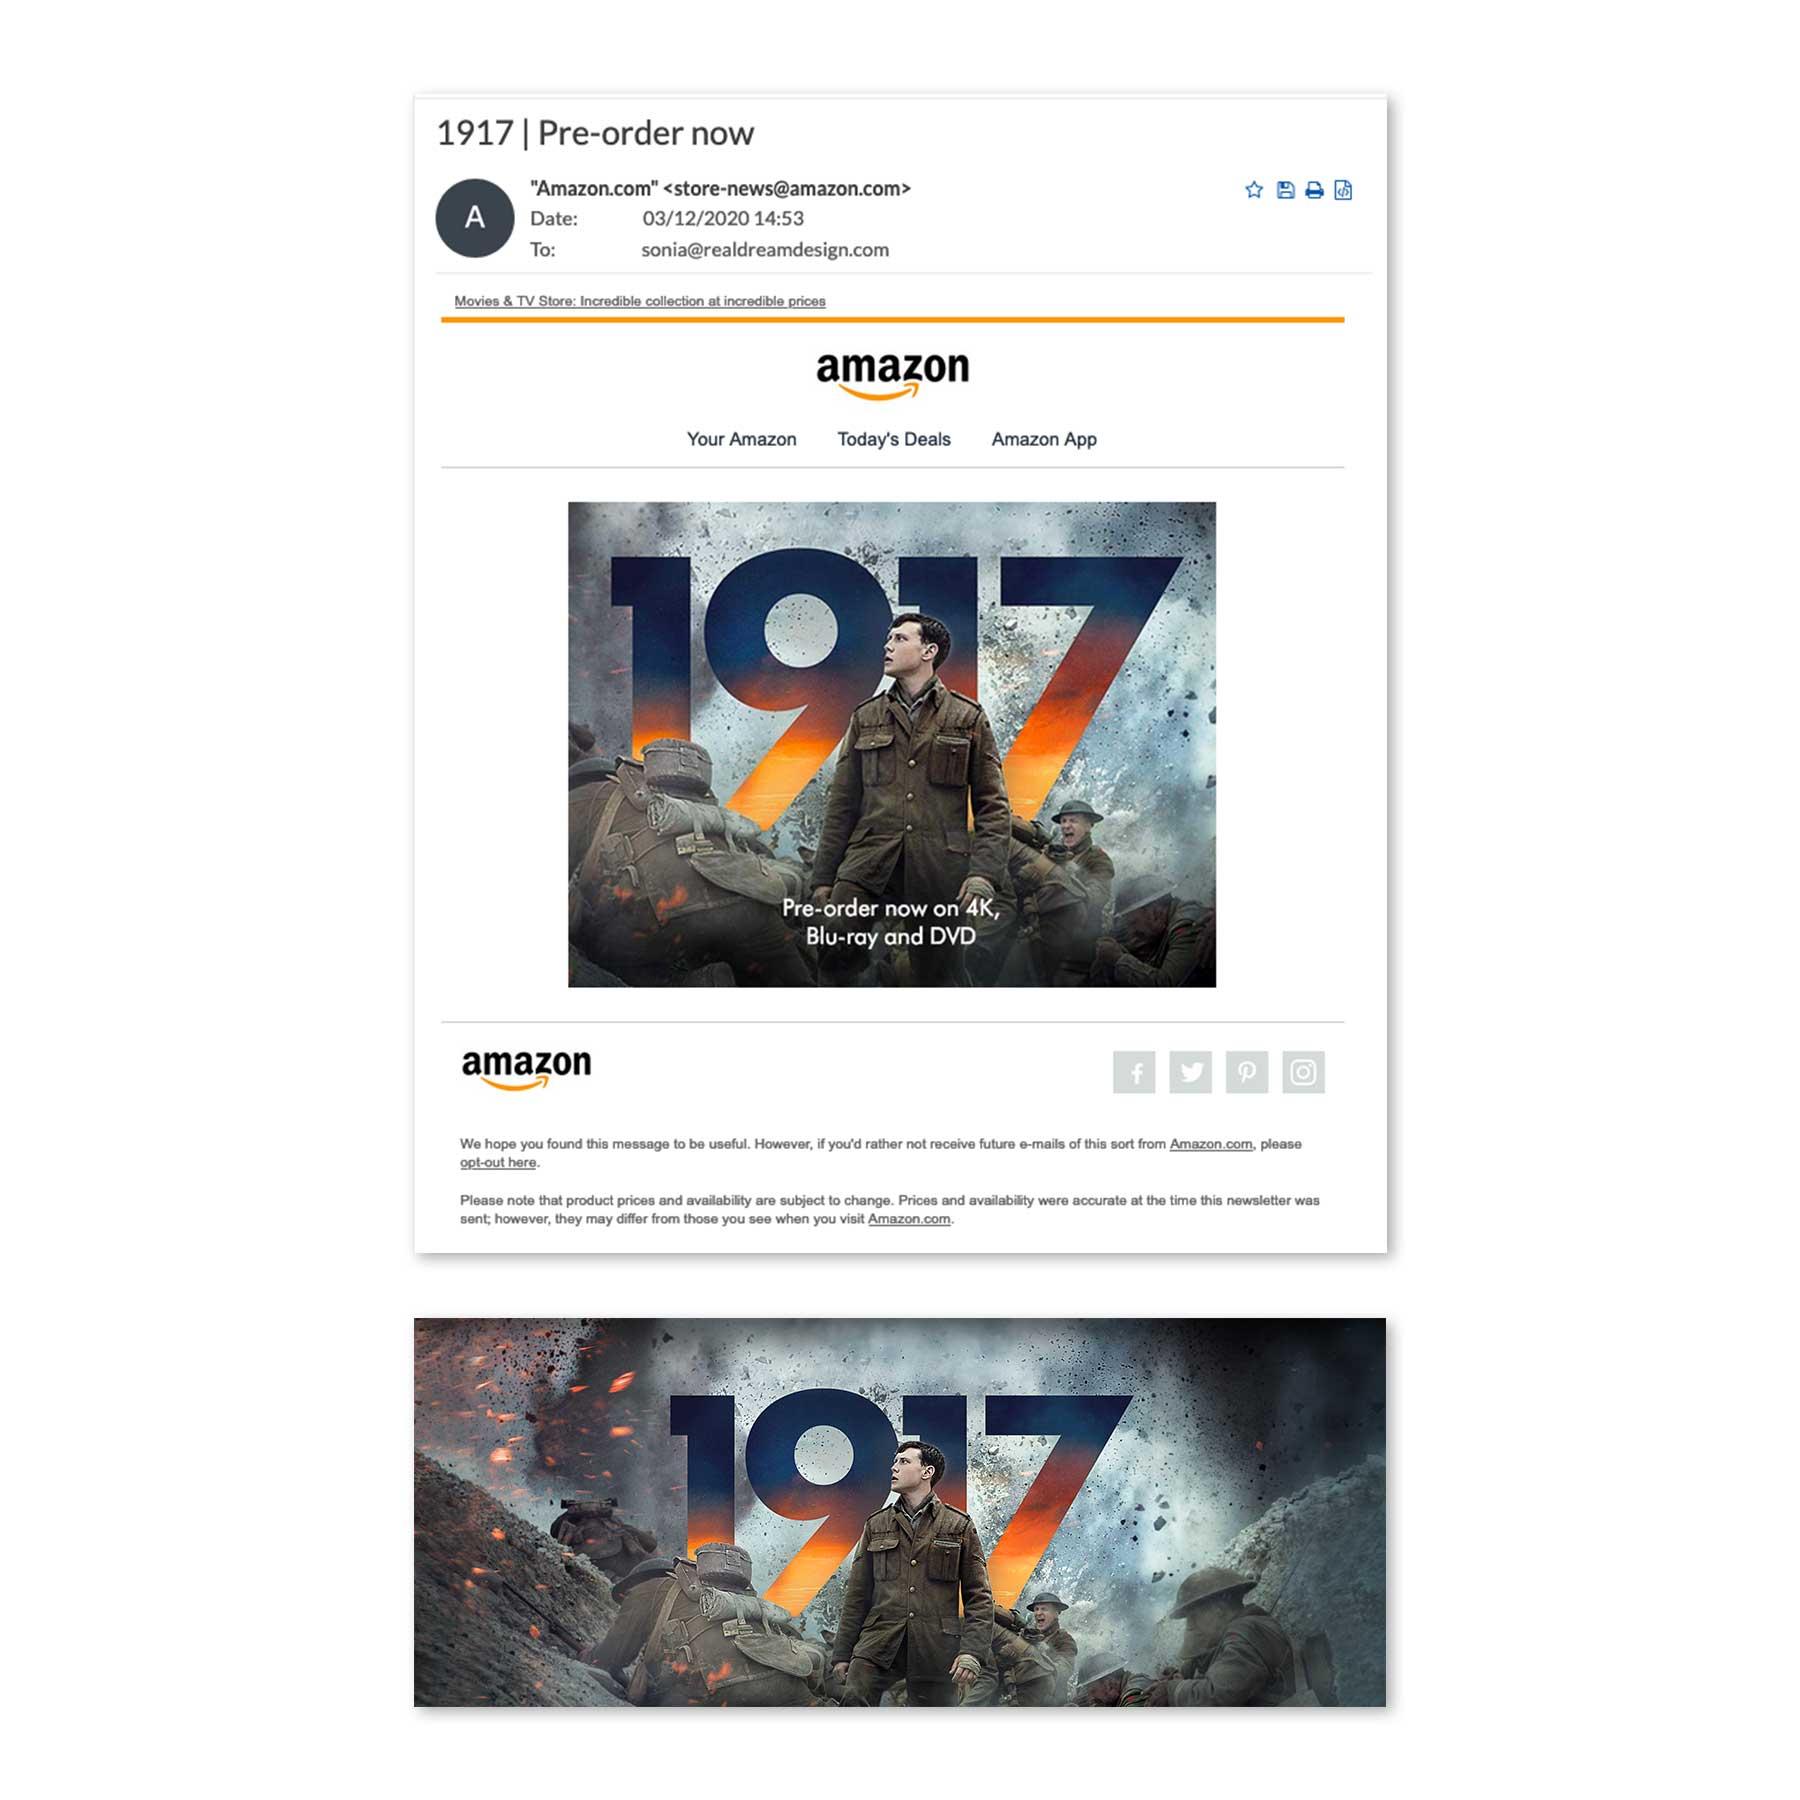 1917 Amazon Preorder Email Blast